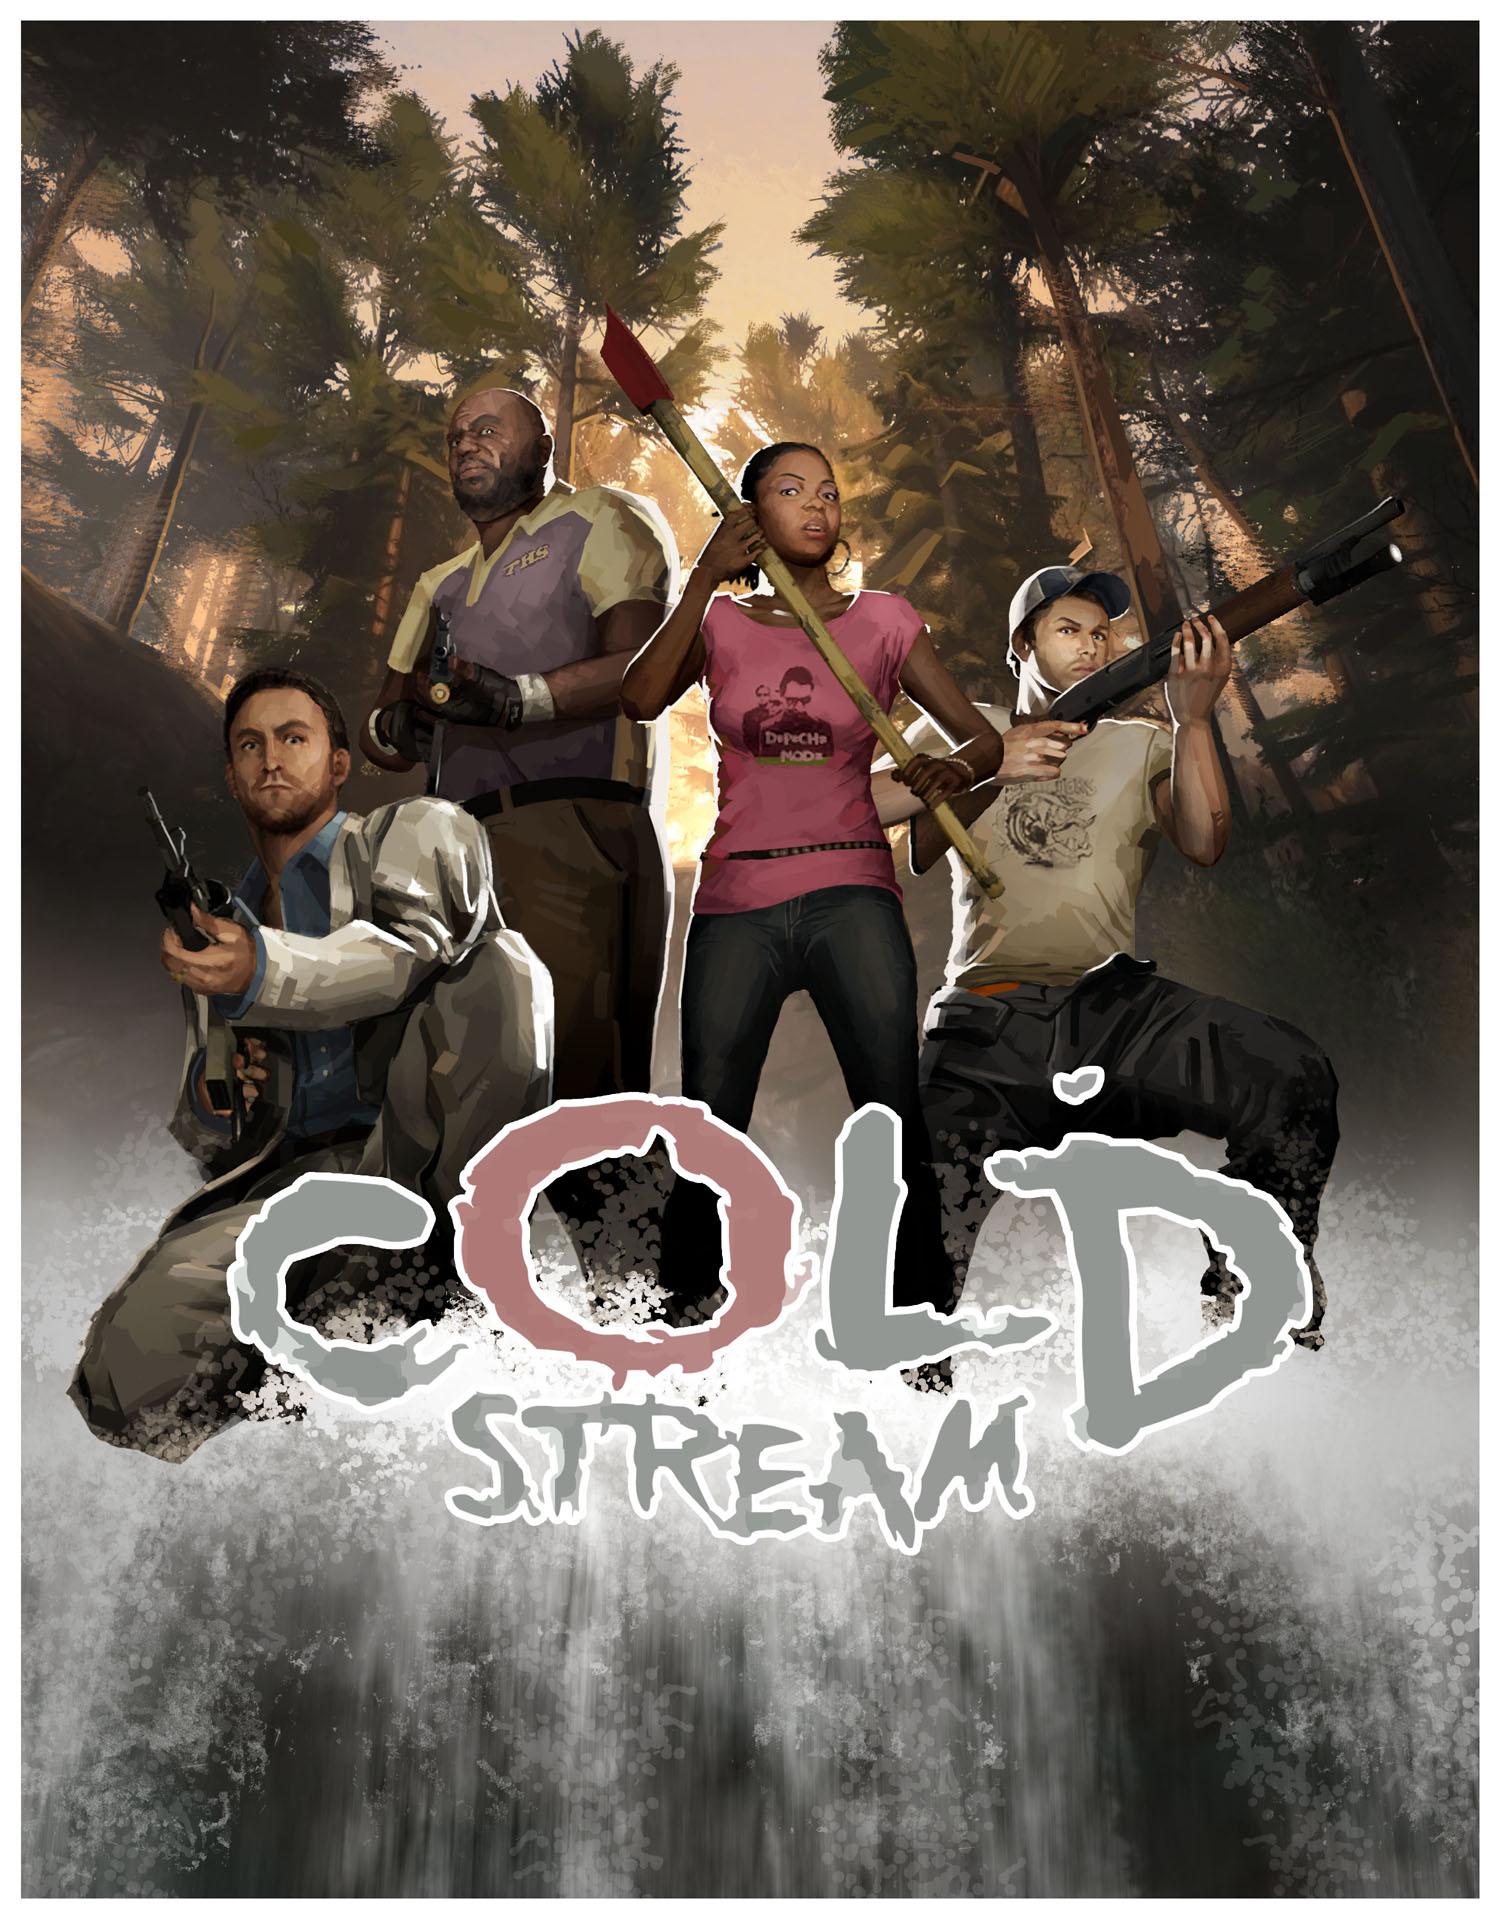 Cold Stream Poster - WIP by Urser on DeviantArt